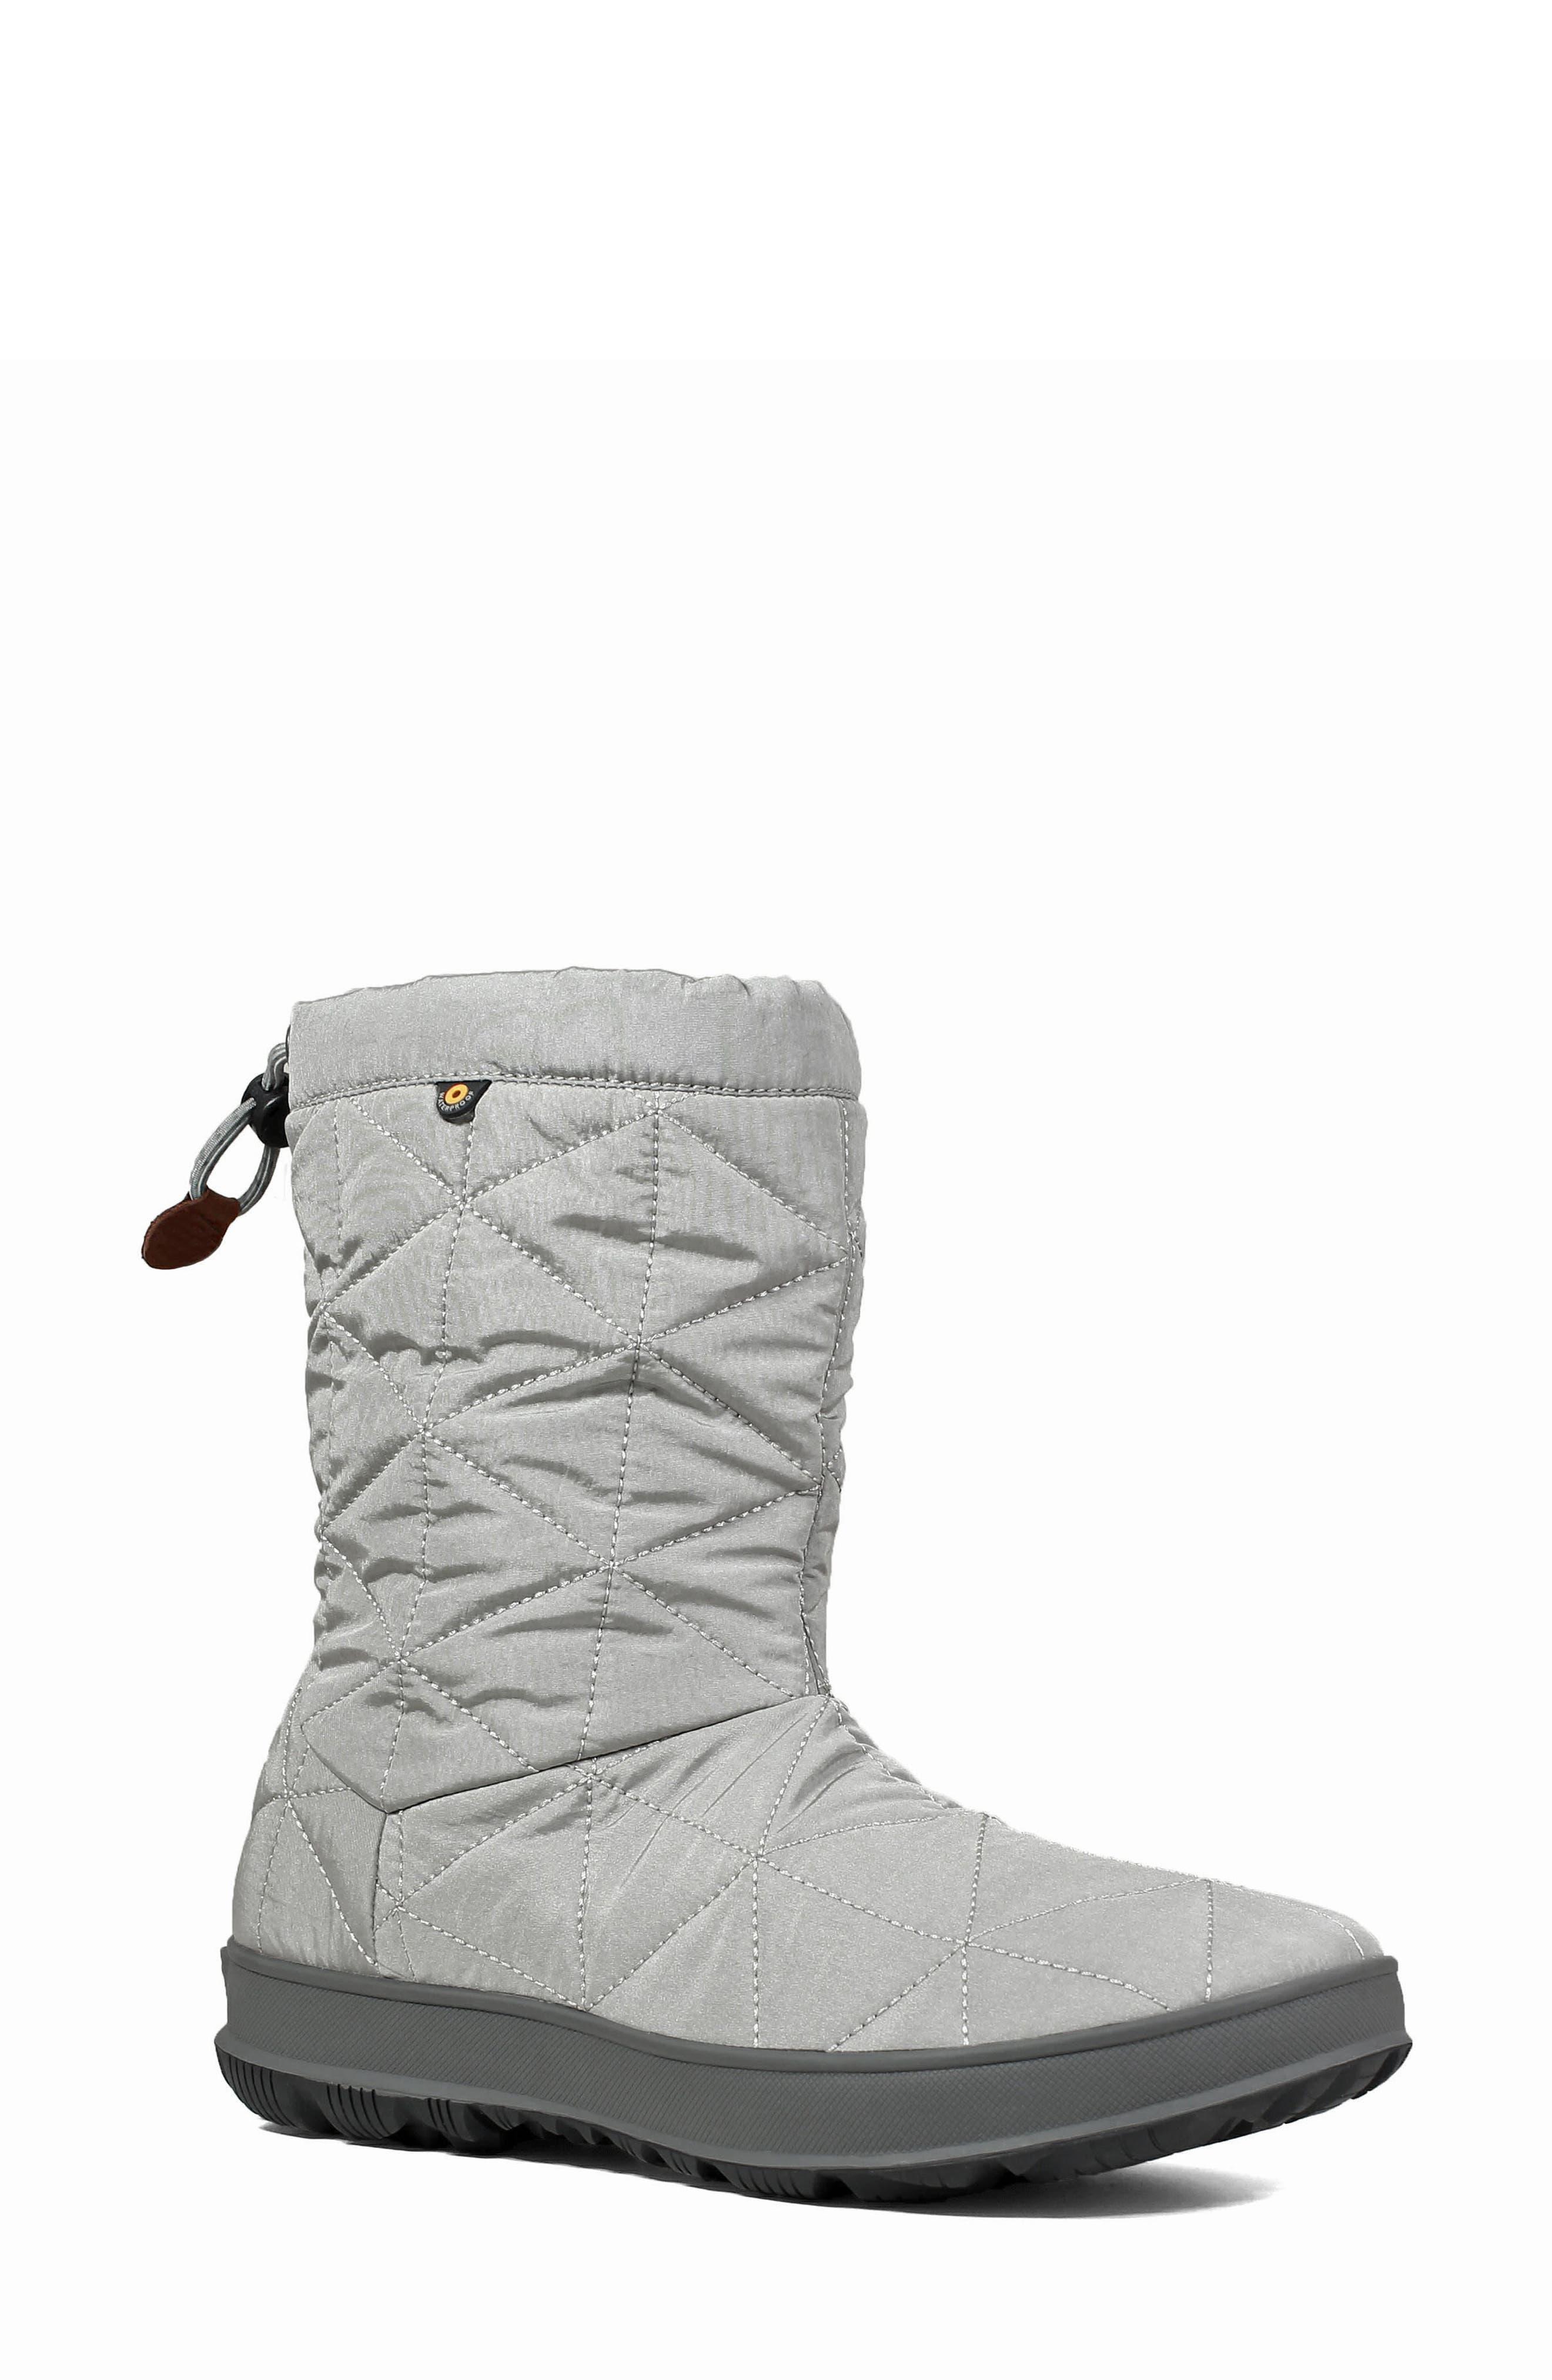 Bogs Mid Snowday Waterproof Bootie, Grey